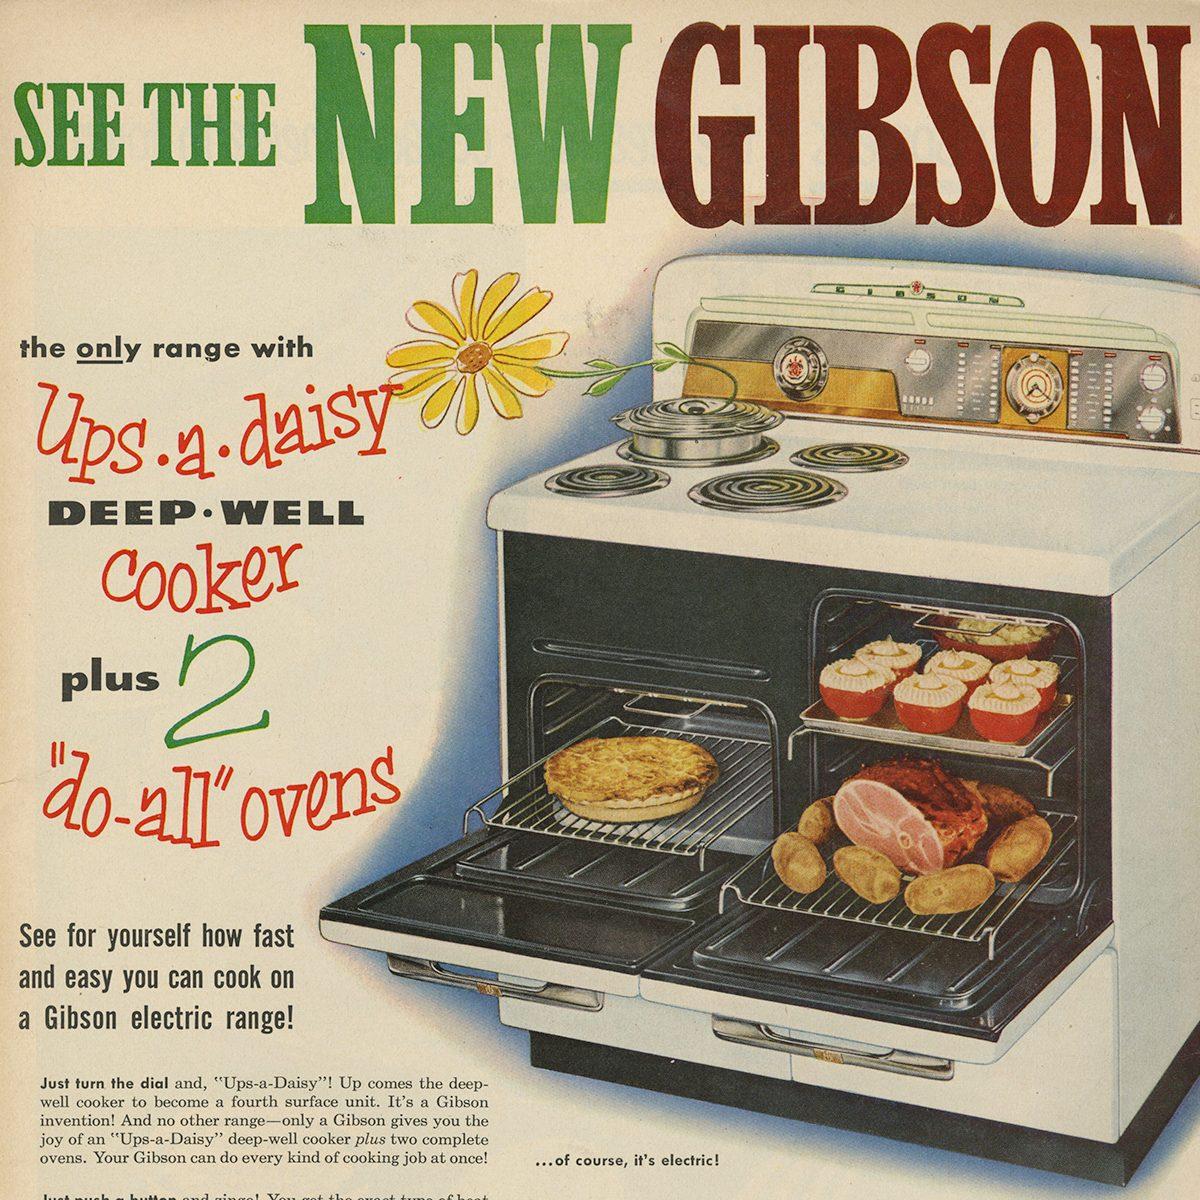 Gibson Electric Range ad